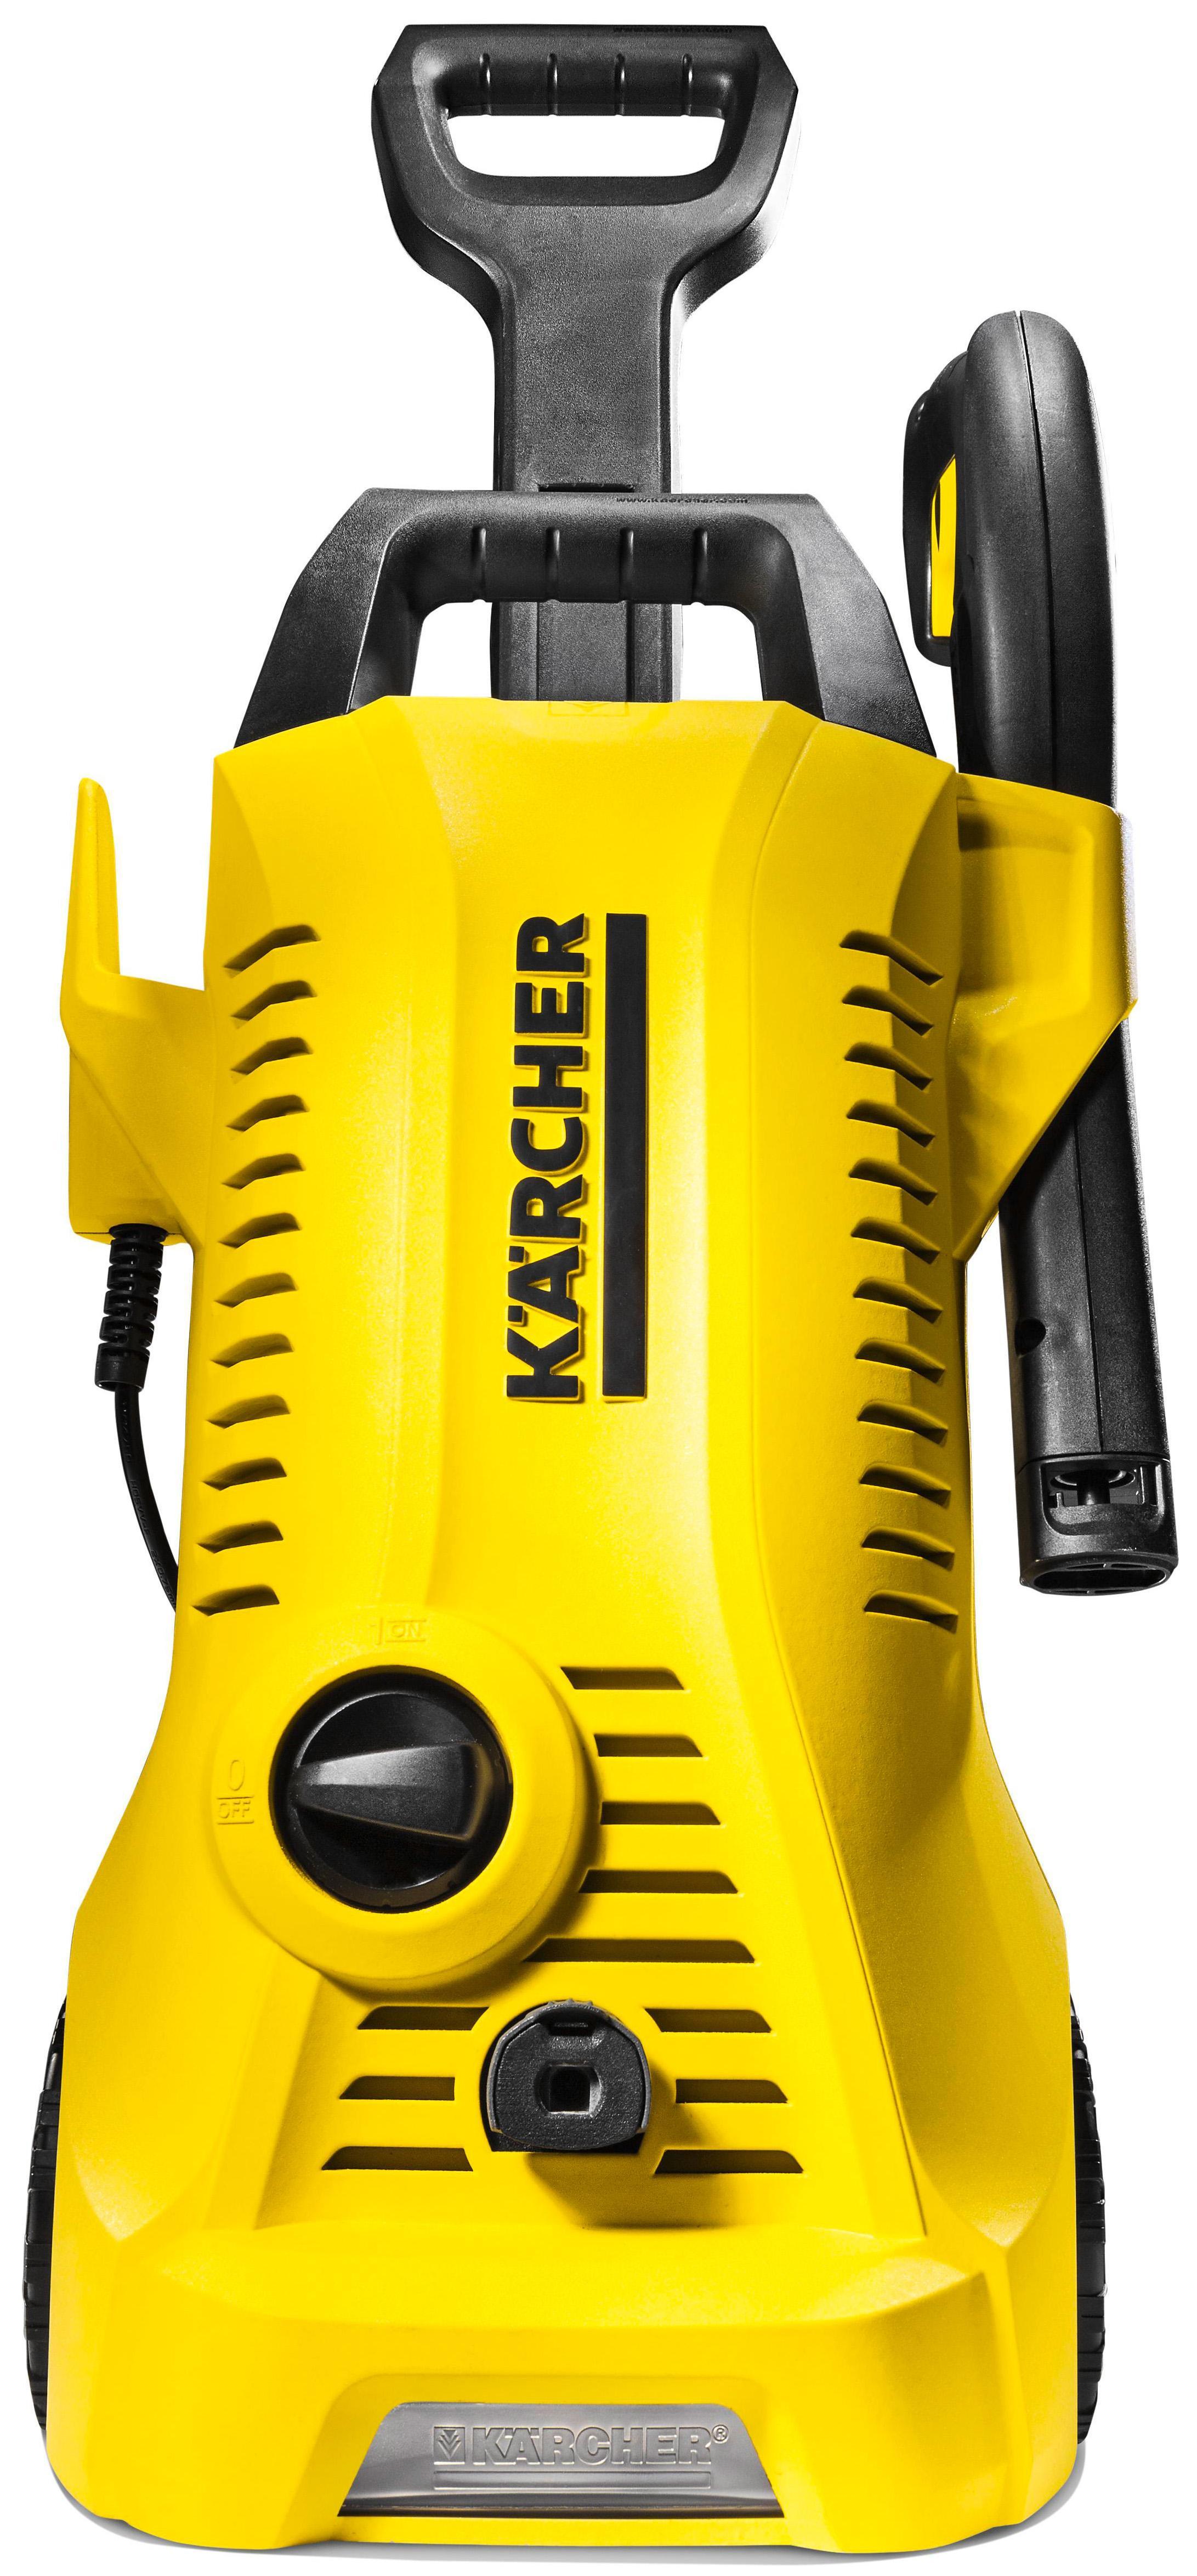 Krcher Trendy Karcher G Dc Performance Series Psi Gpm Gas